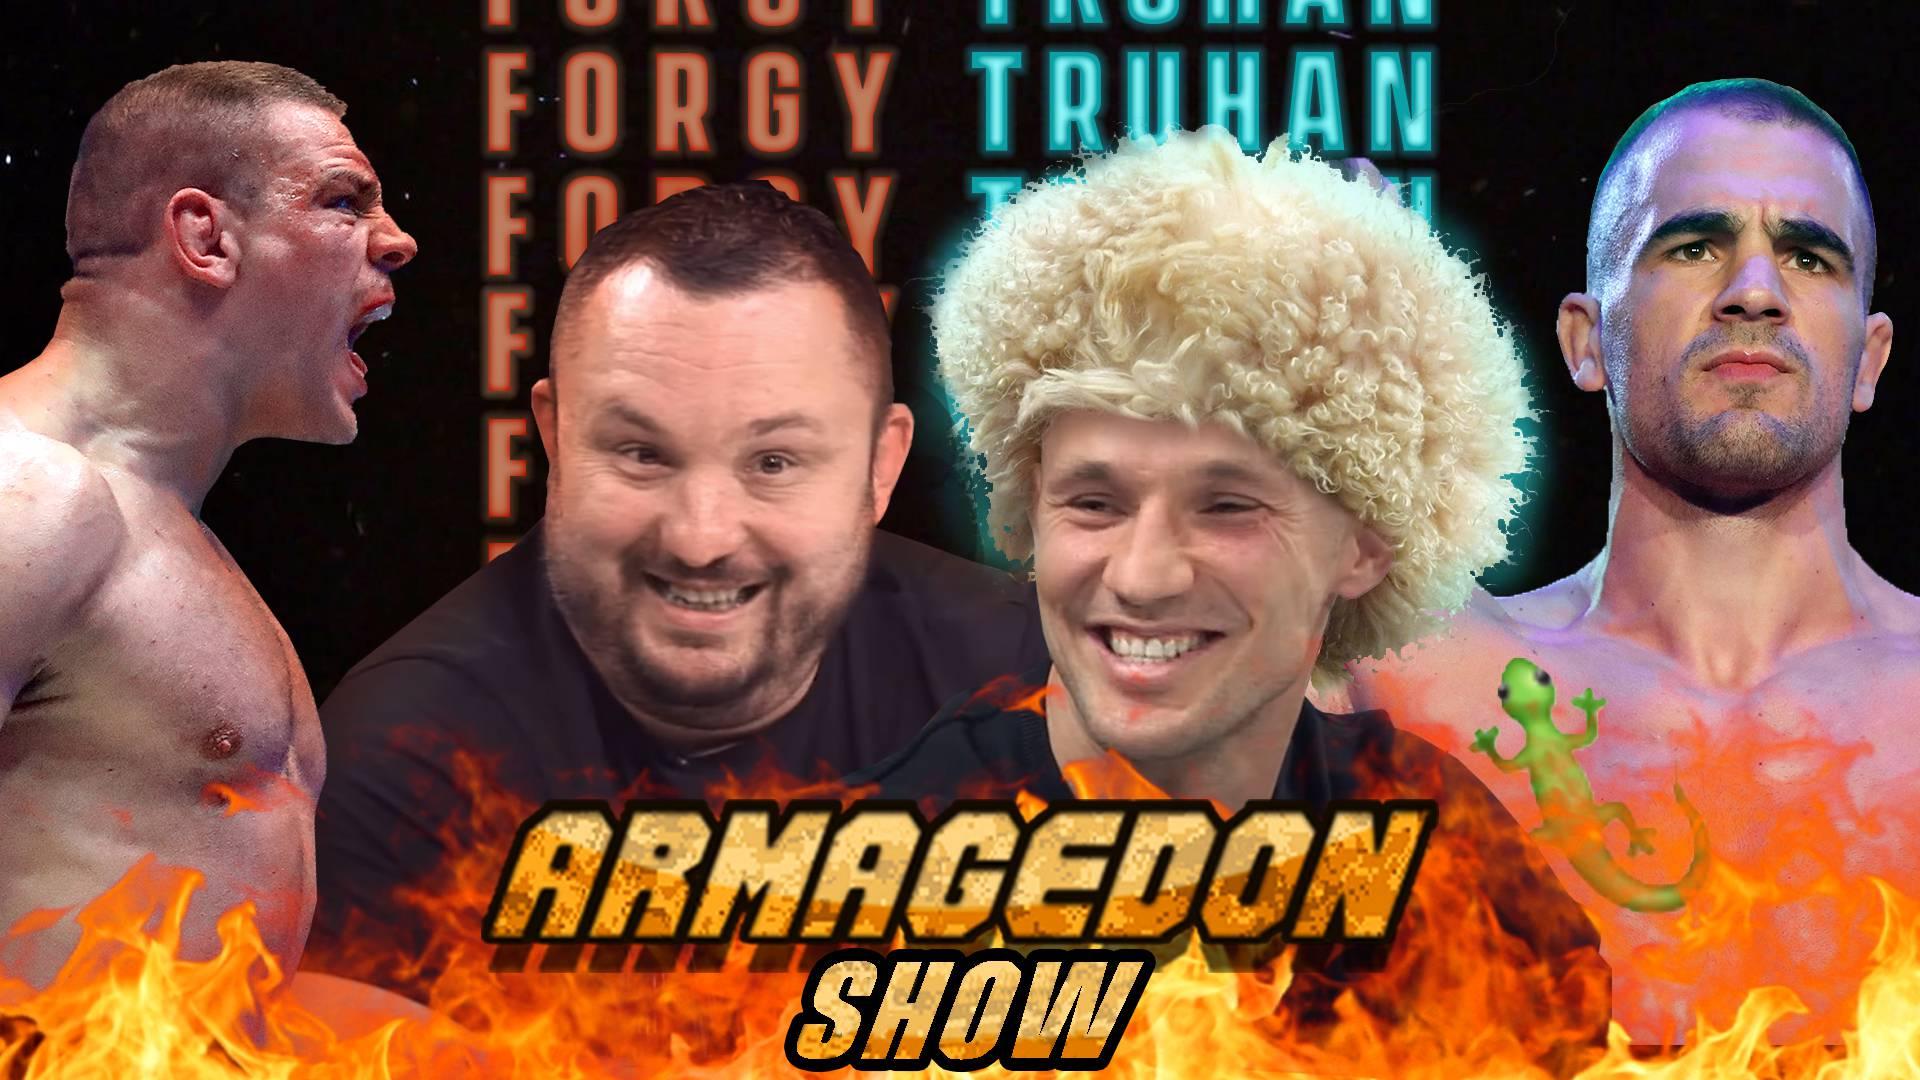 FNC Podcast: Stiže veliko finale Armagedona, Forgy i Truhan analizirali Khabib vs. Gaethje!